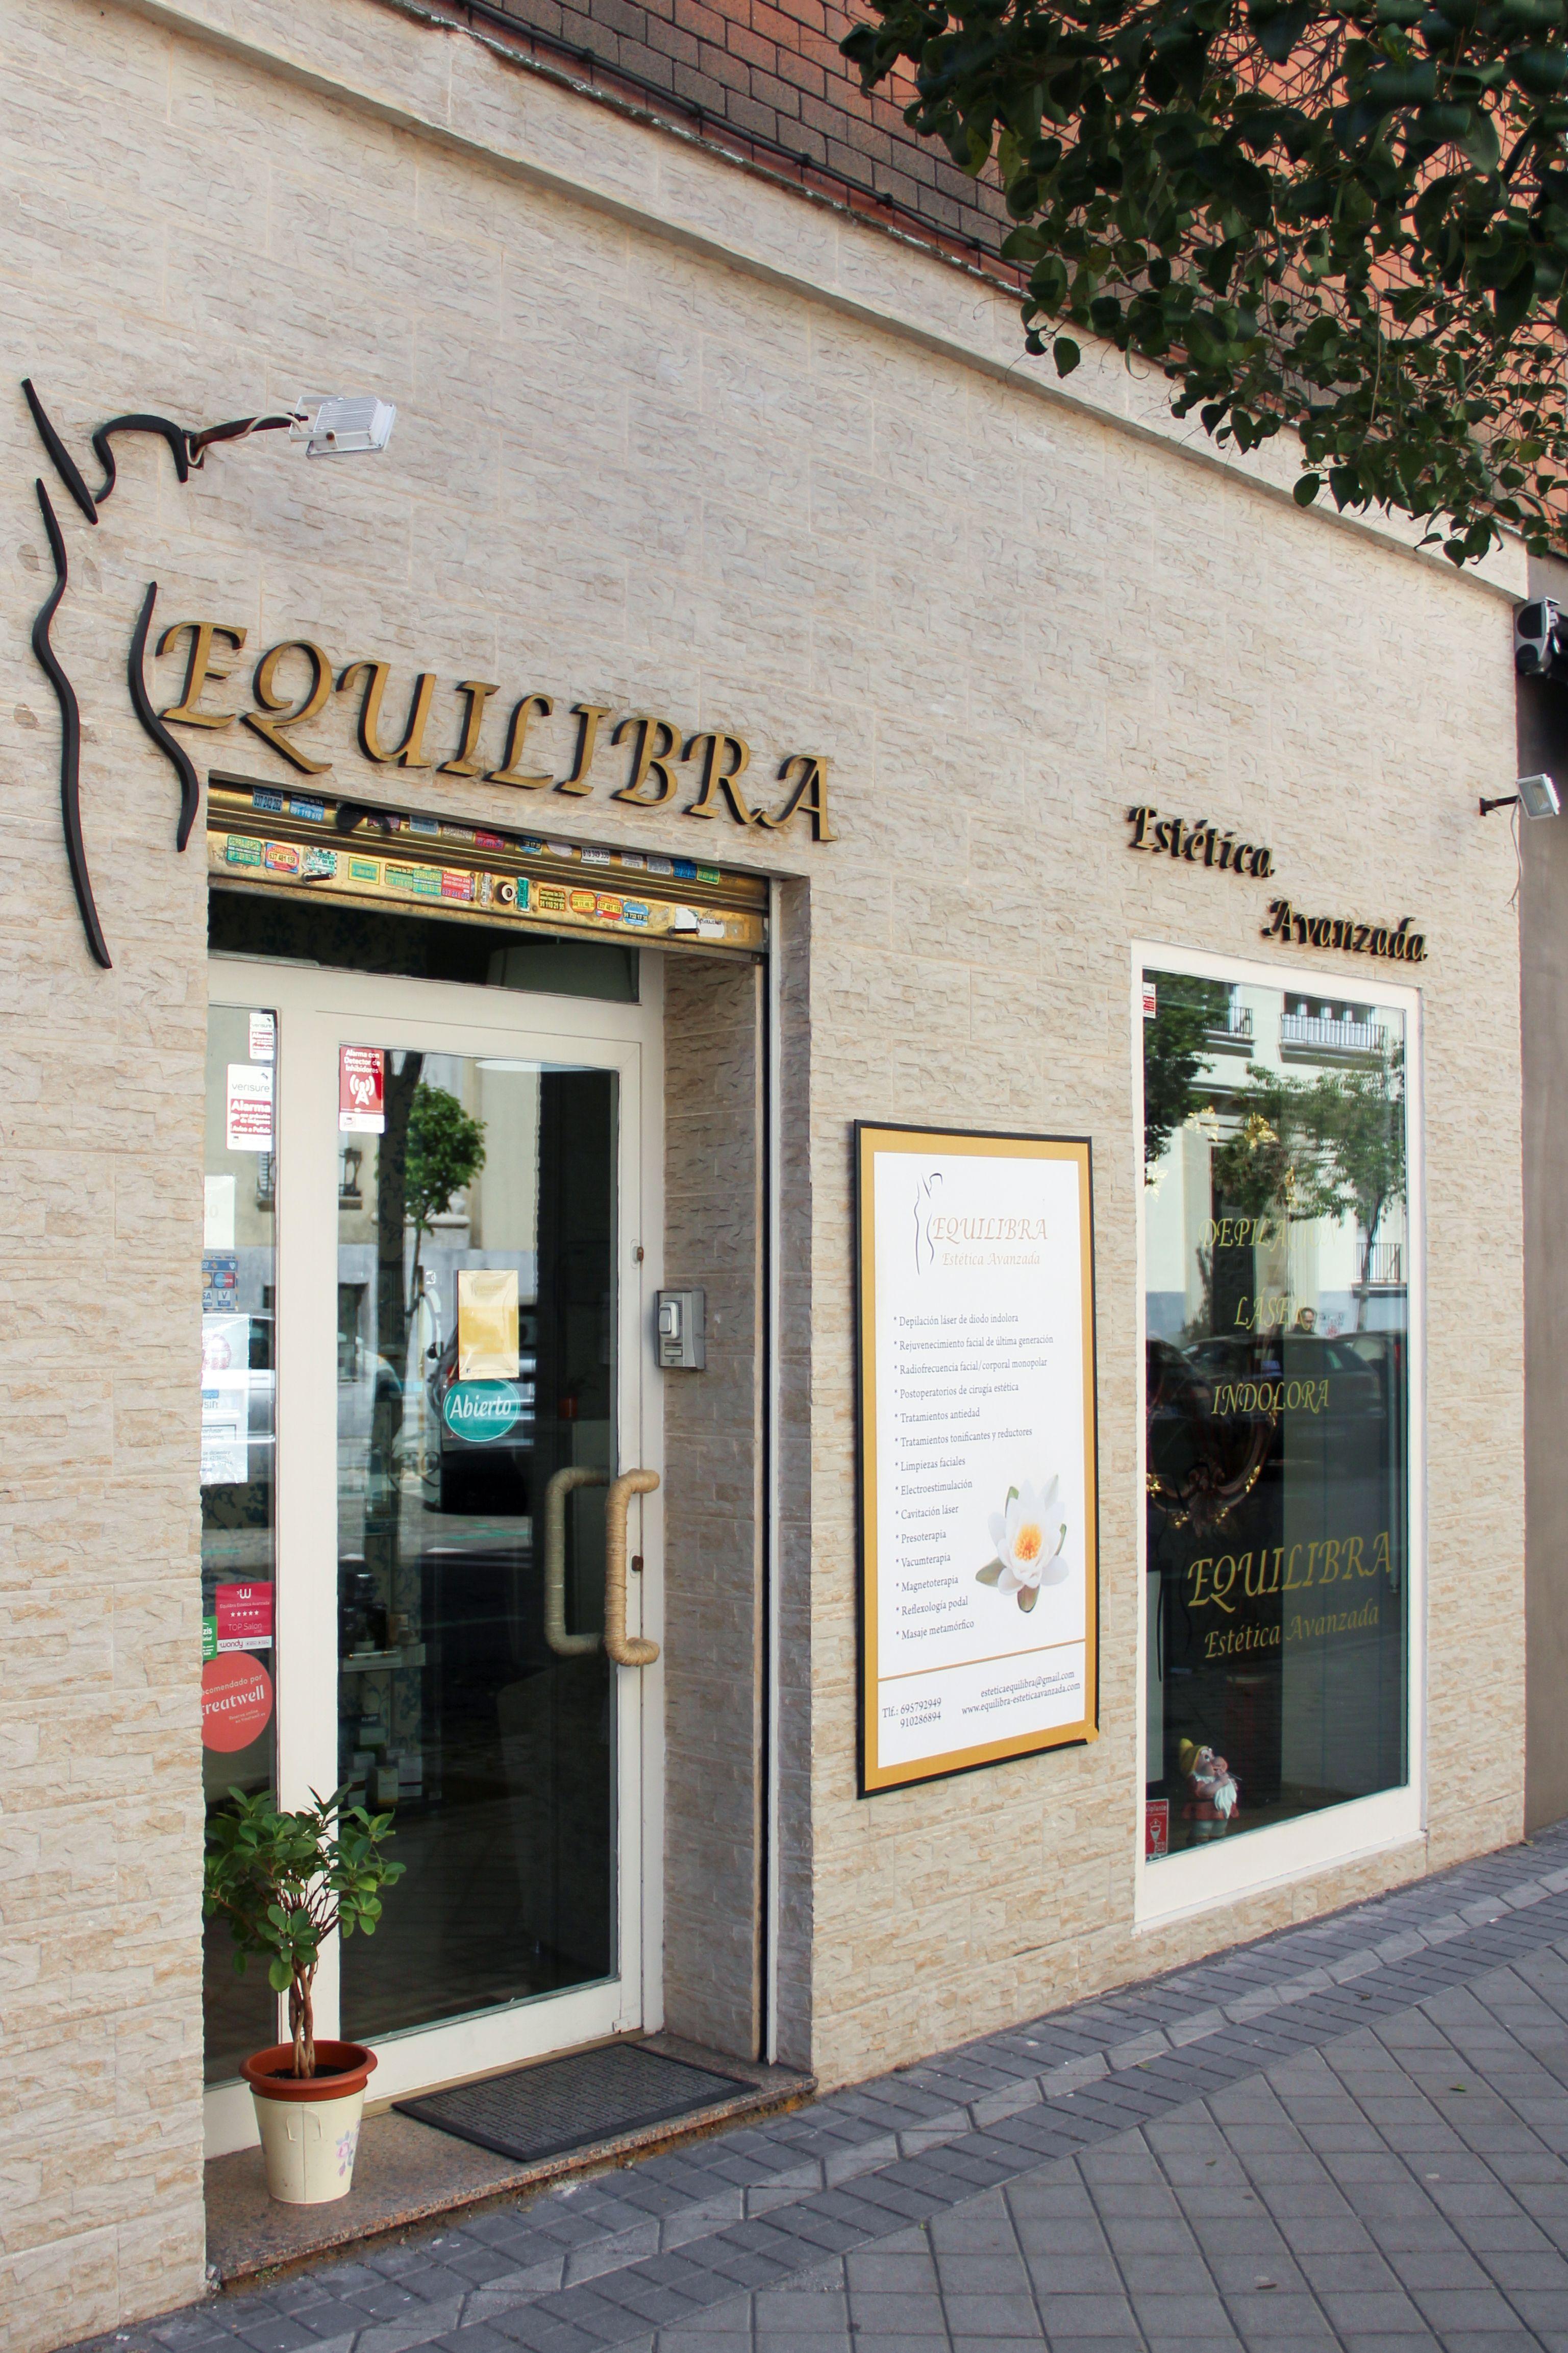 Foto 1 de Centro de estética en Madrid | Equilibra Estética Avanzada